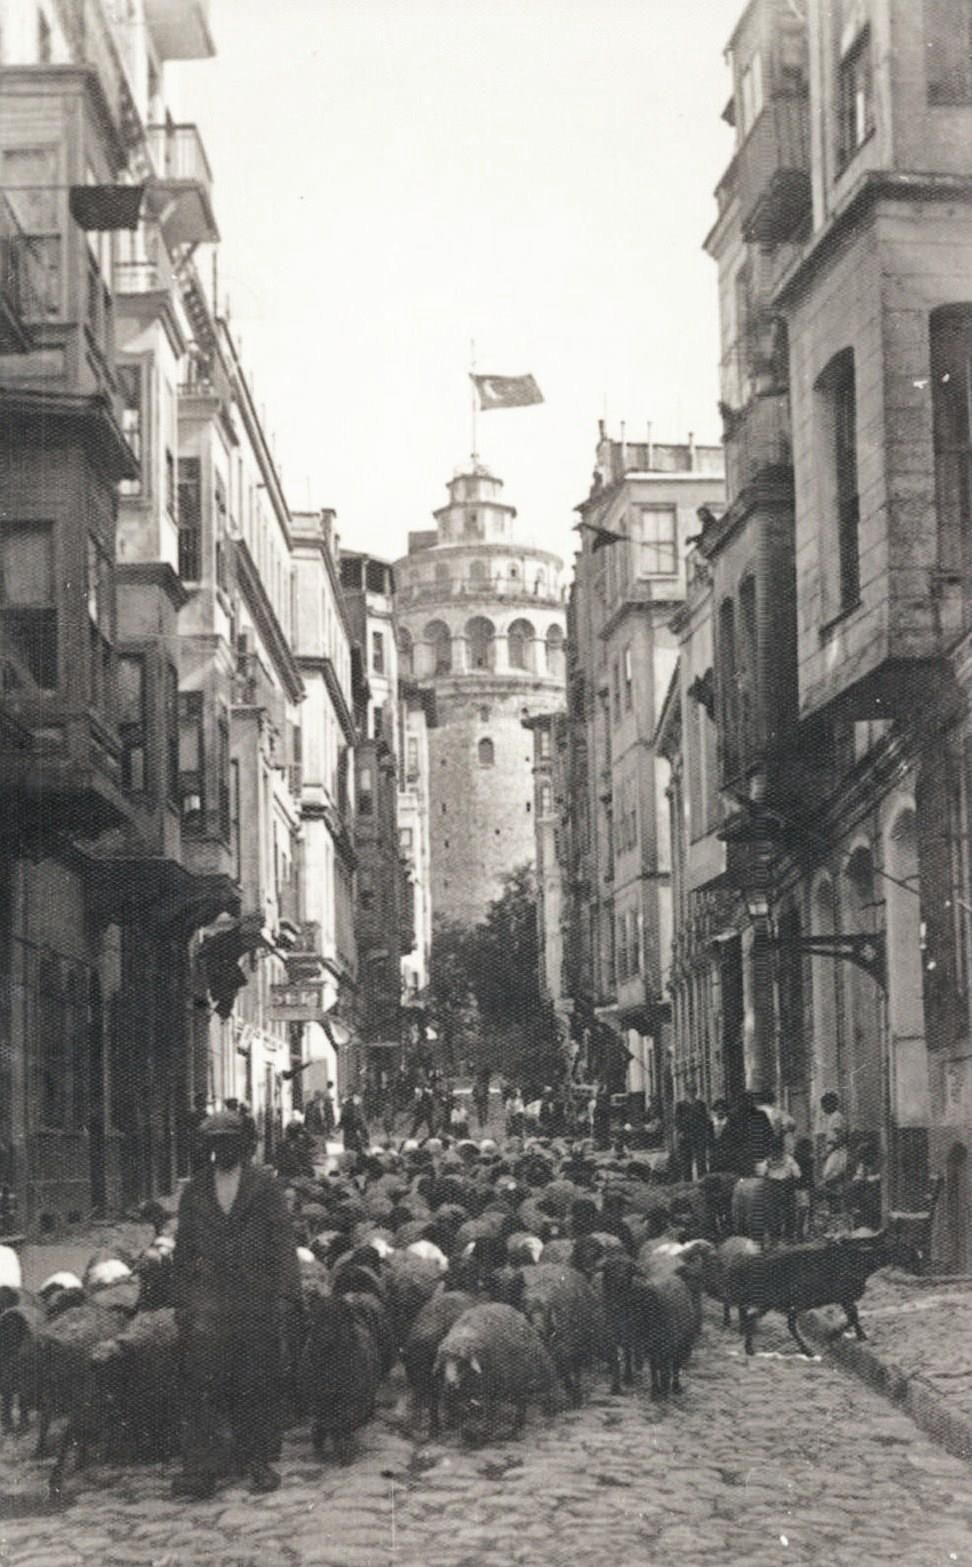 eski istanbul fotograflari arsivi galata kulesi istanbul fotograf resimler